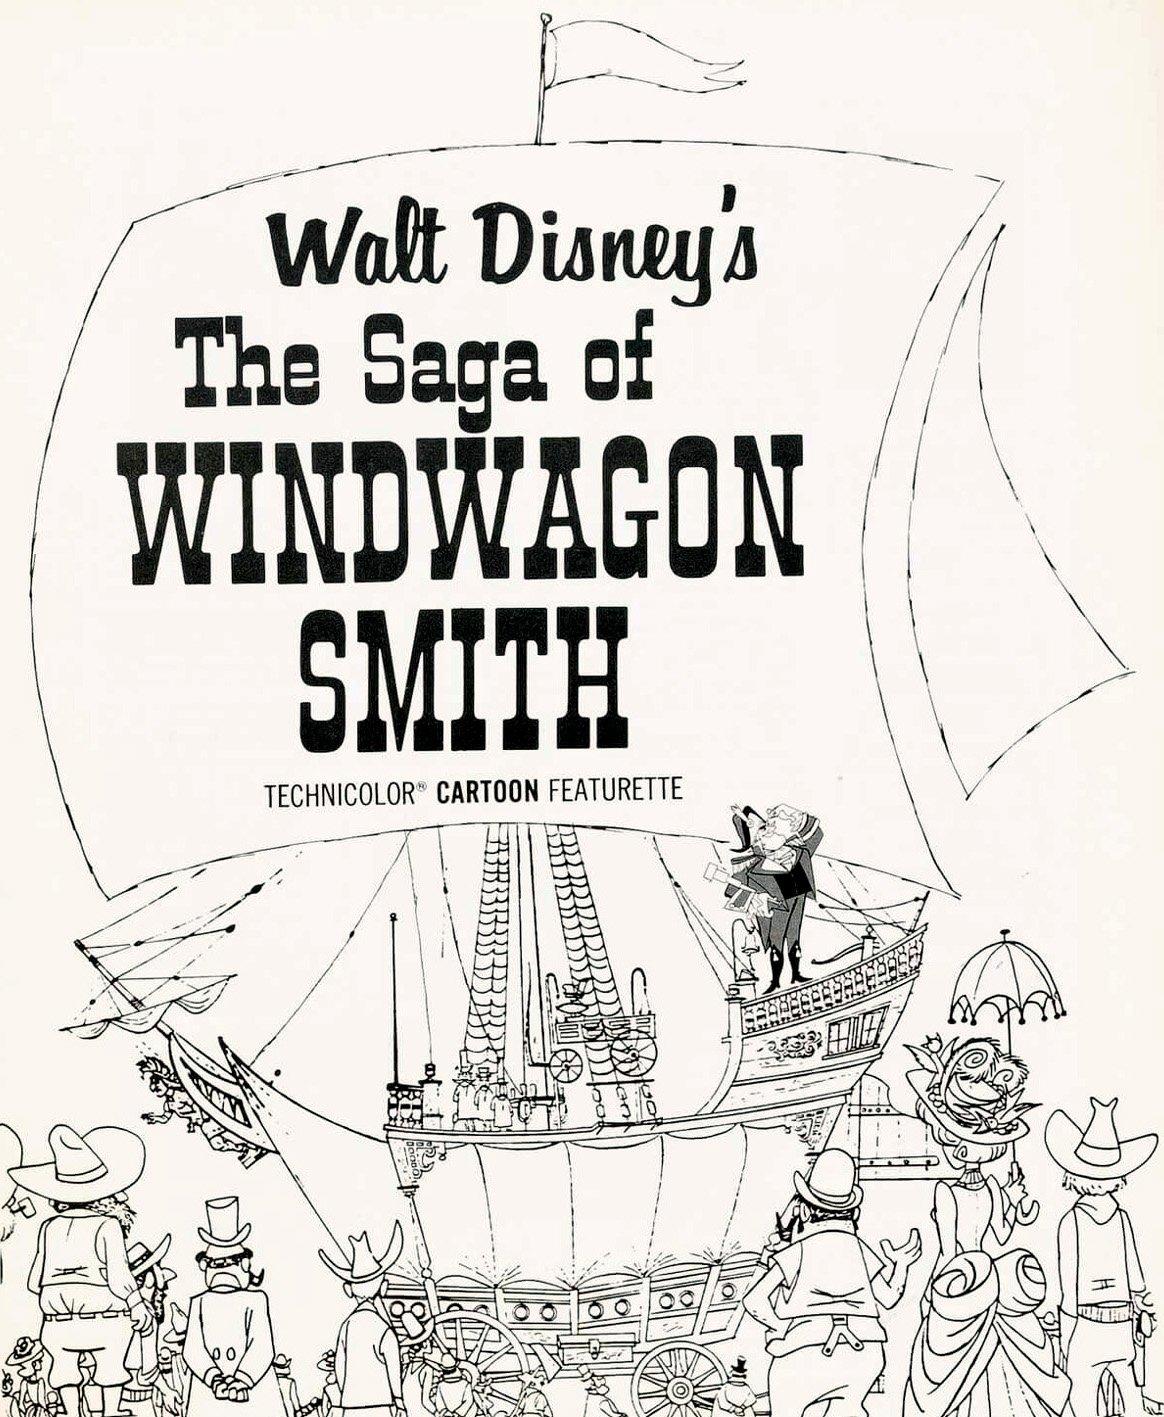 The Saga of Windwagon Smith